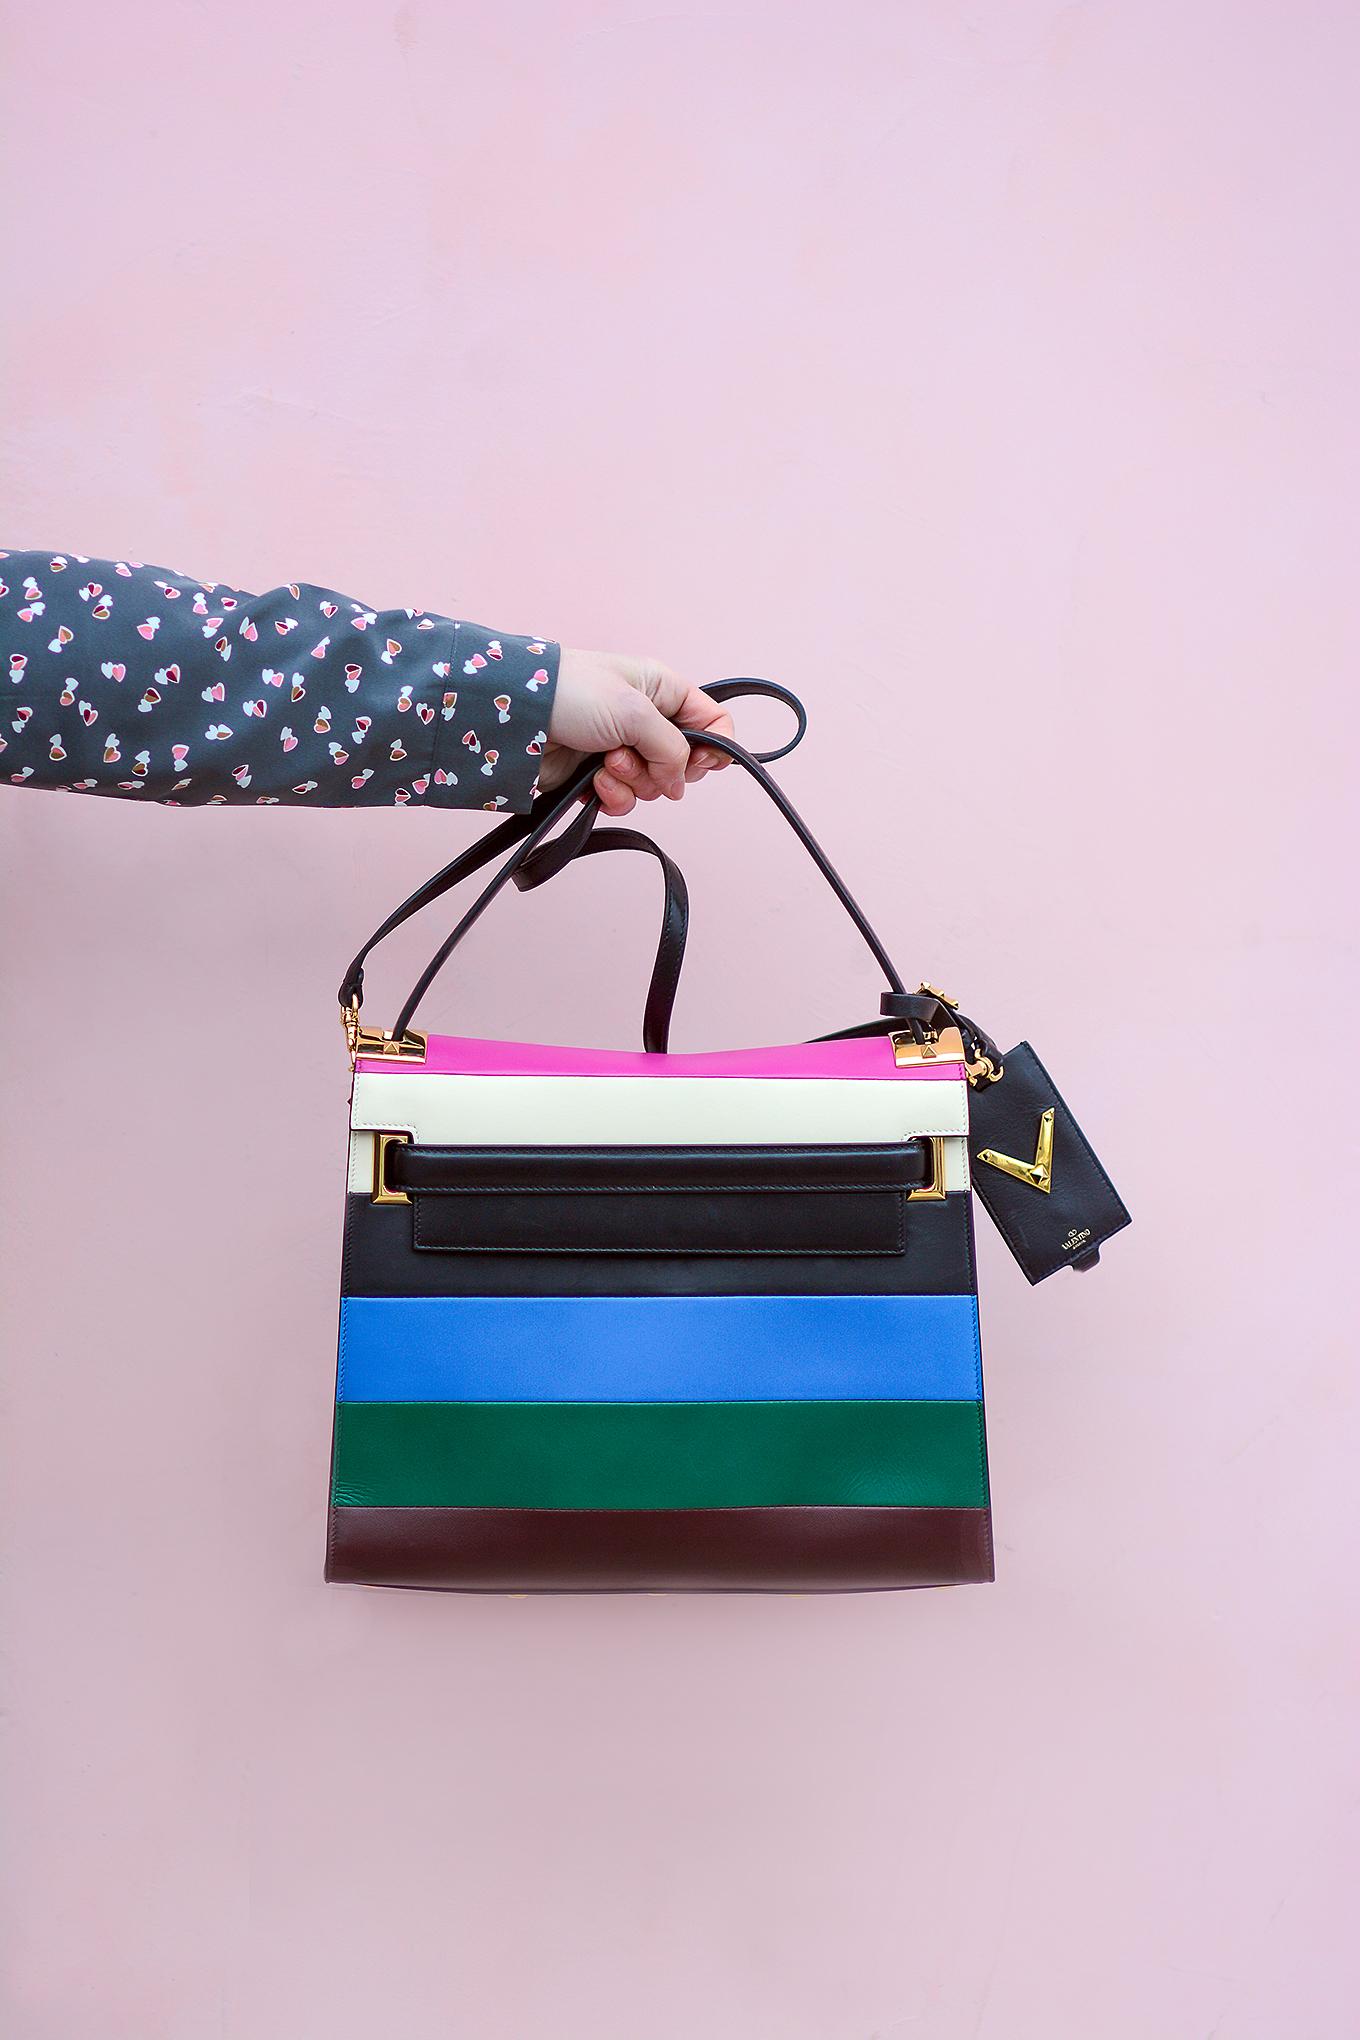 Valentino_My_Rockstud_Top_Handle-Bag